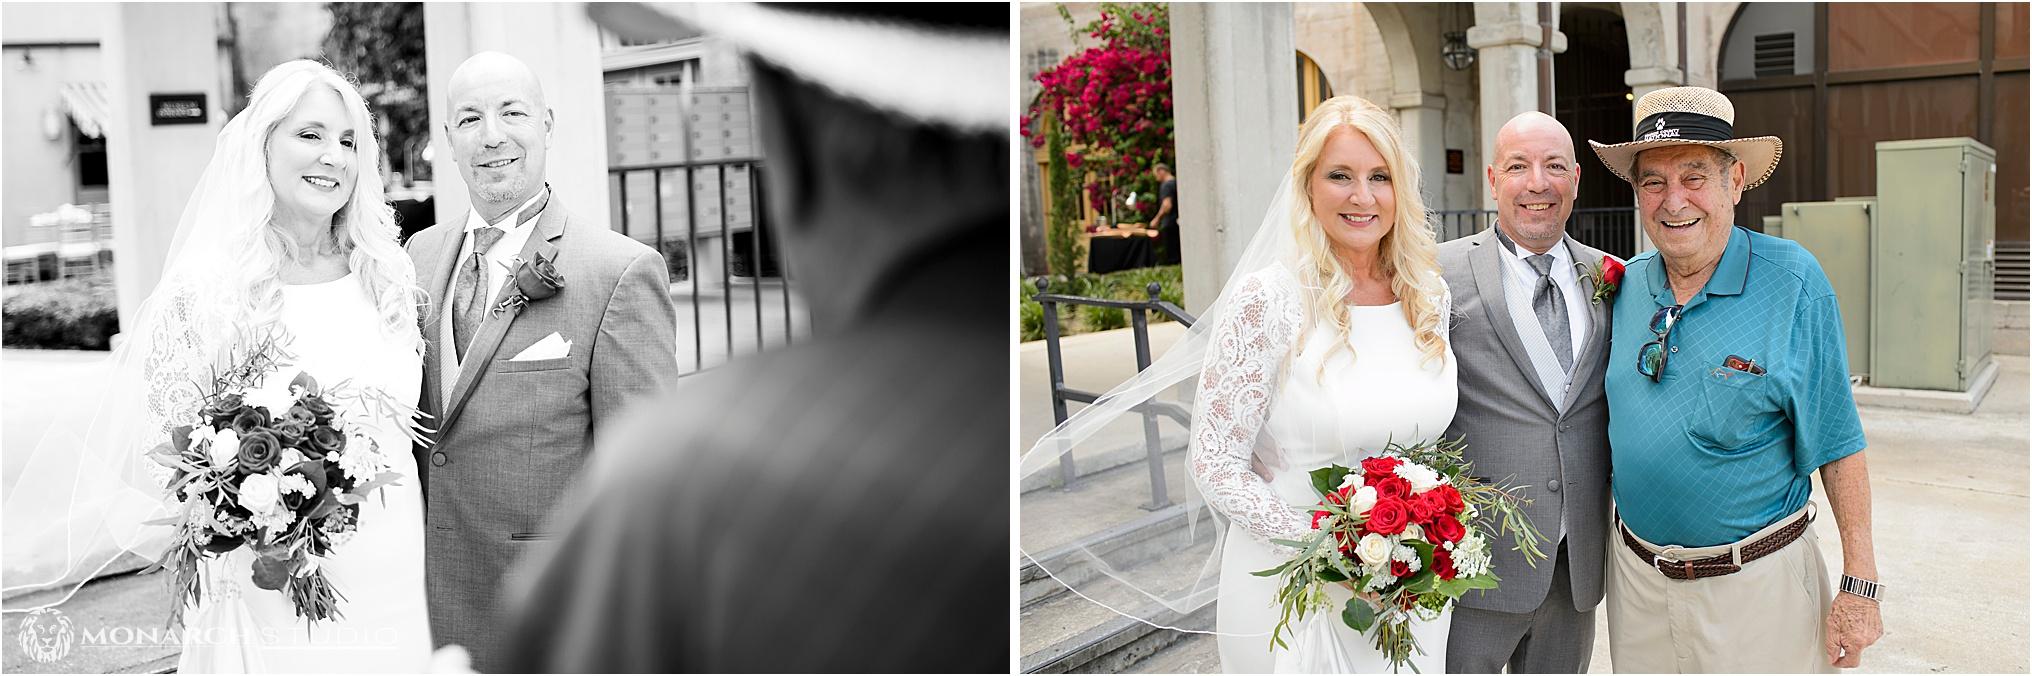 june-2019-saint-augustine-wedding-036.jpg